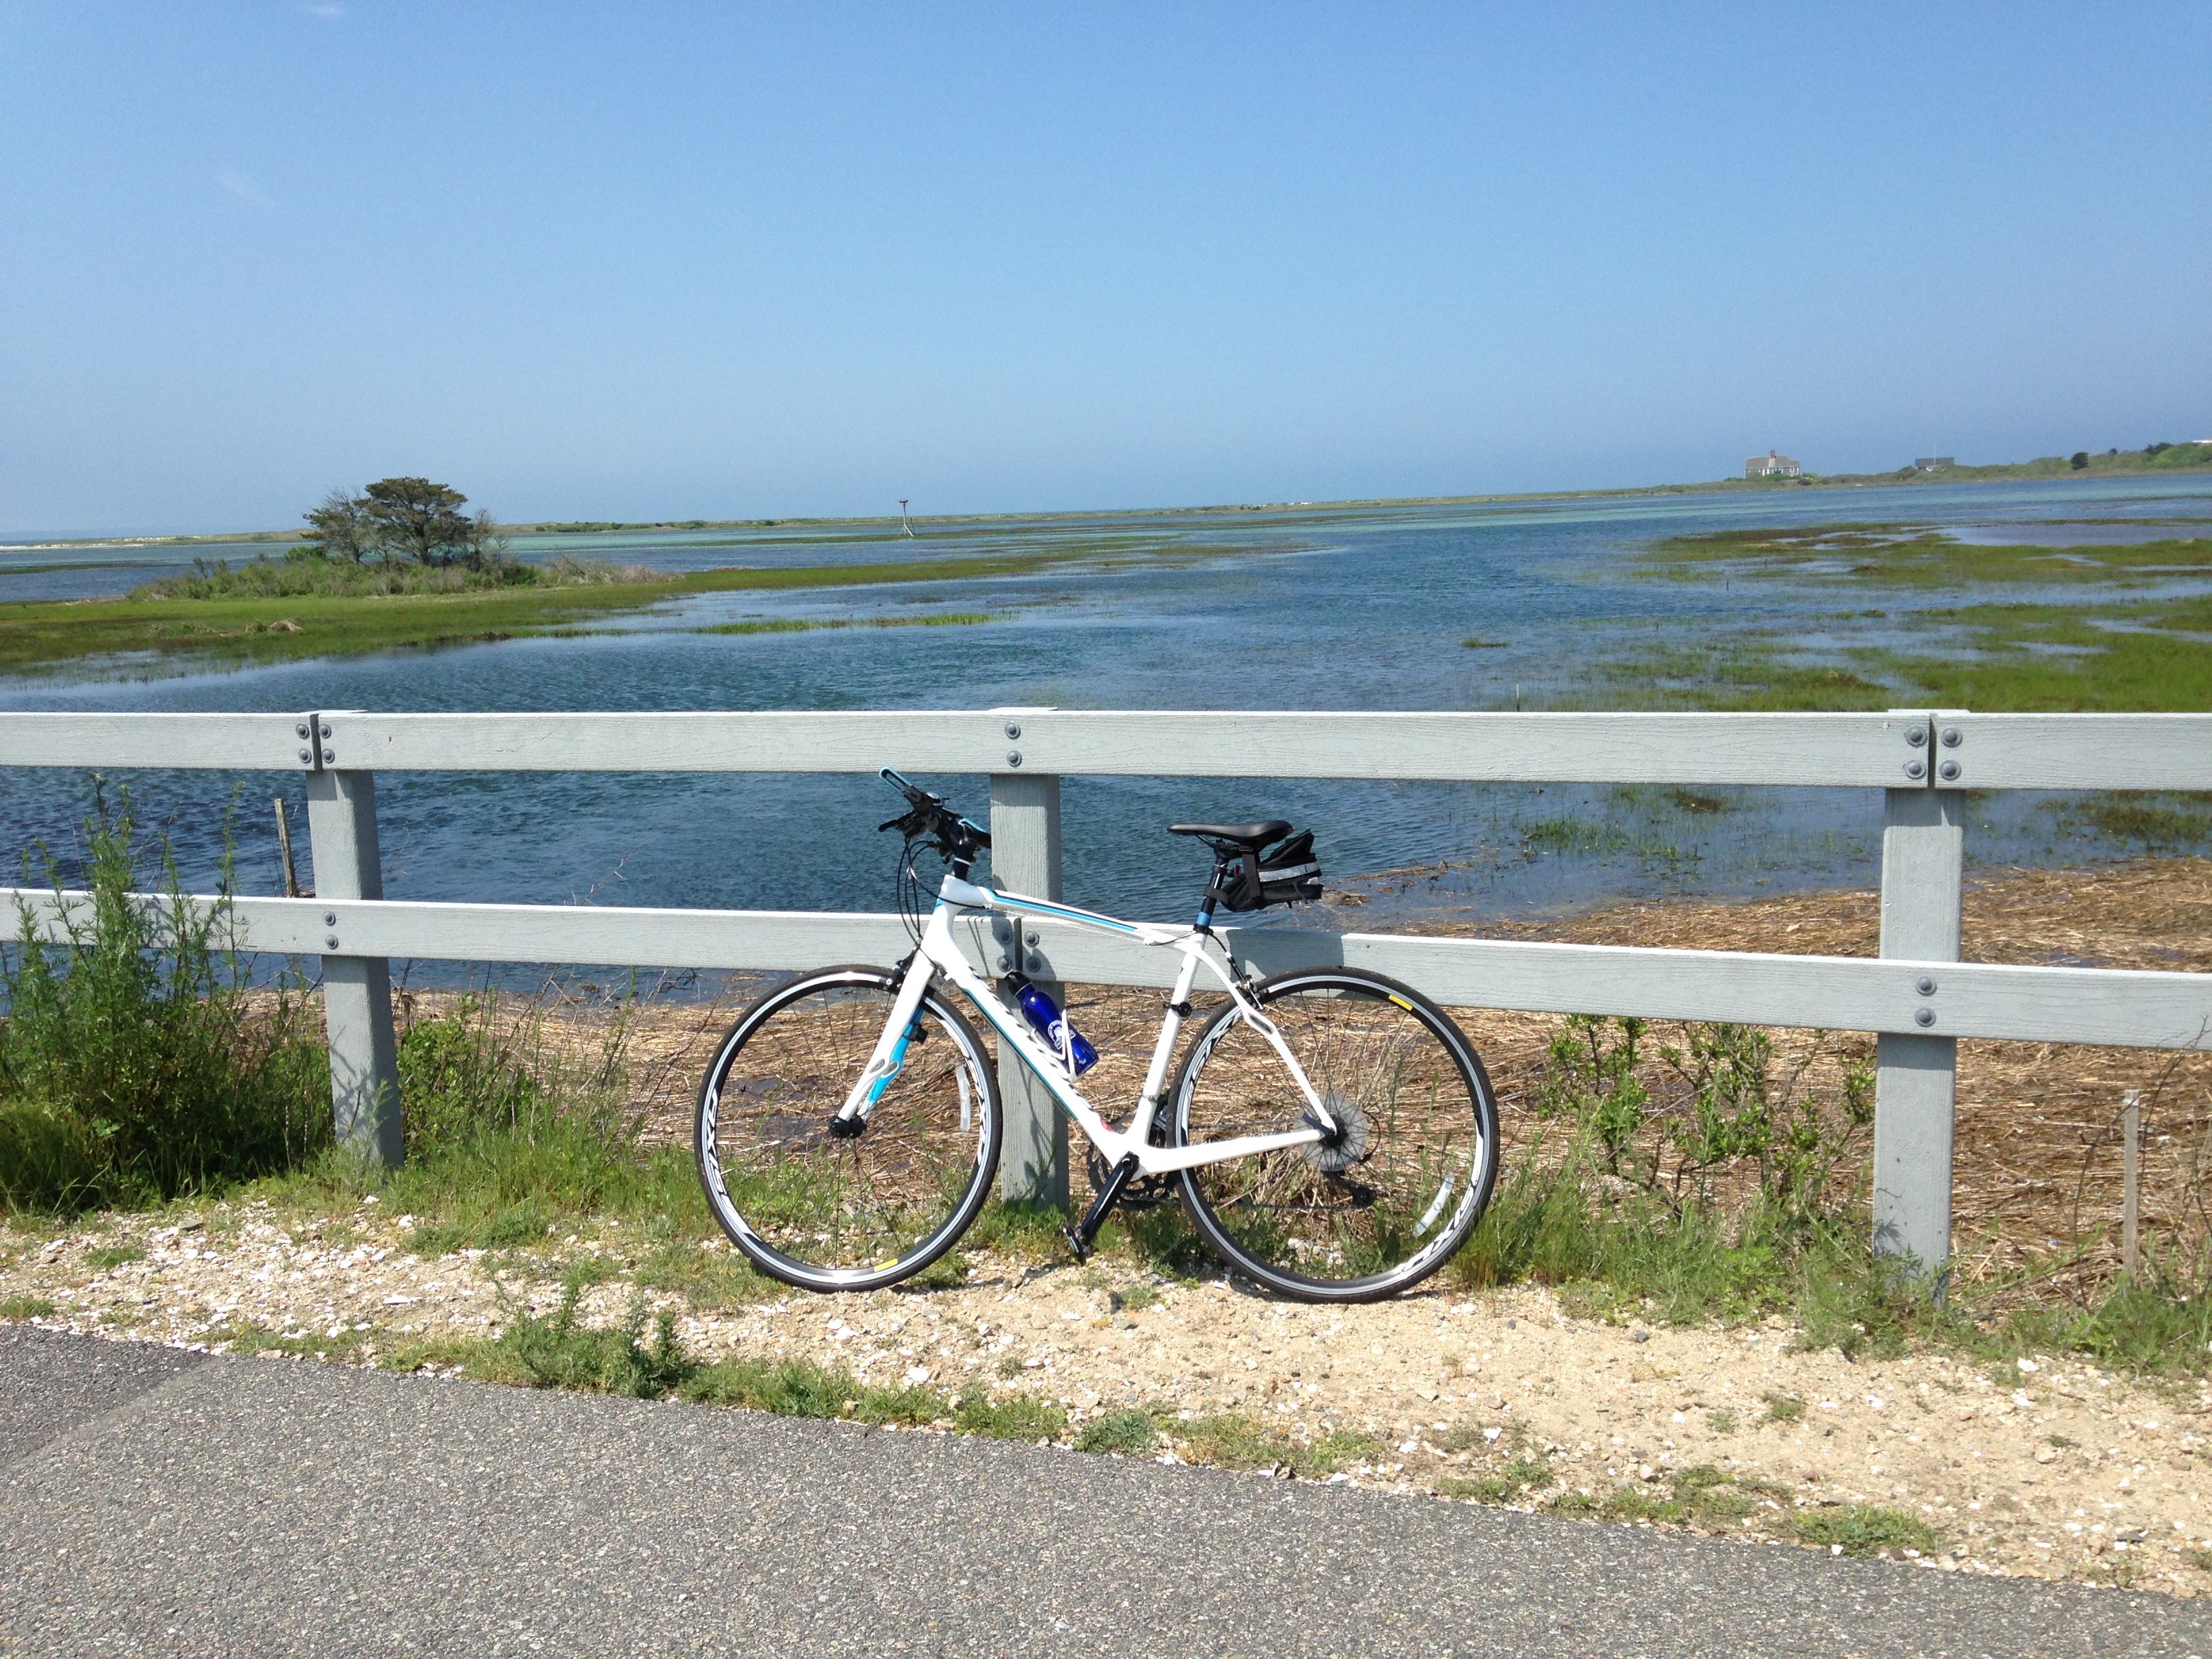 Shining Sea Bikeway – The 300 Committee Land Trust